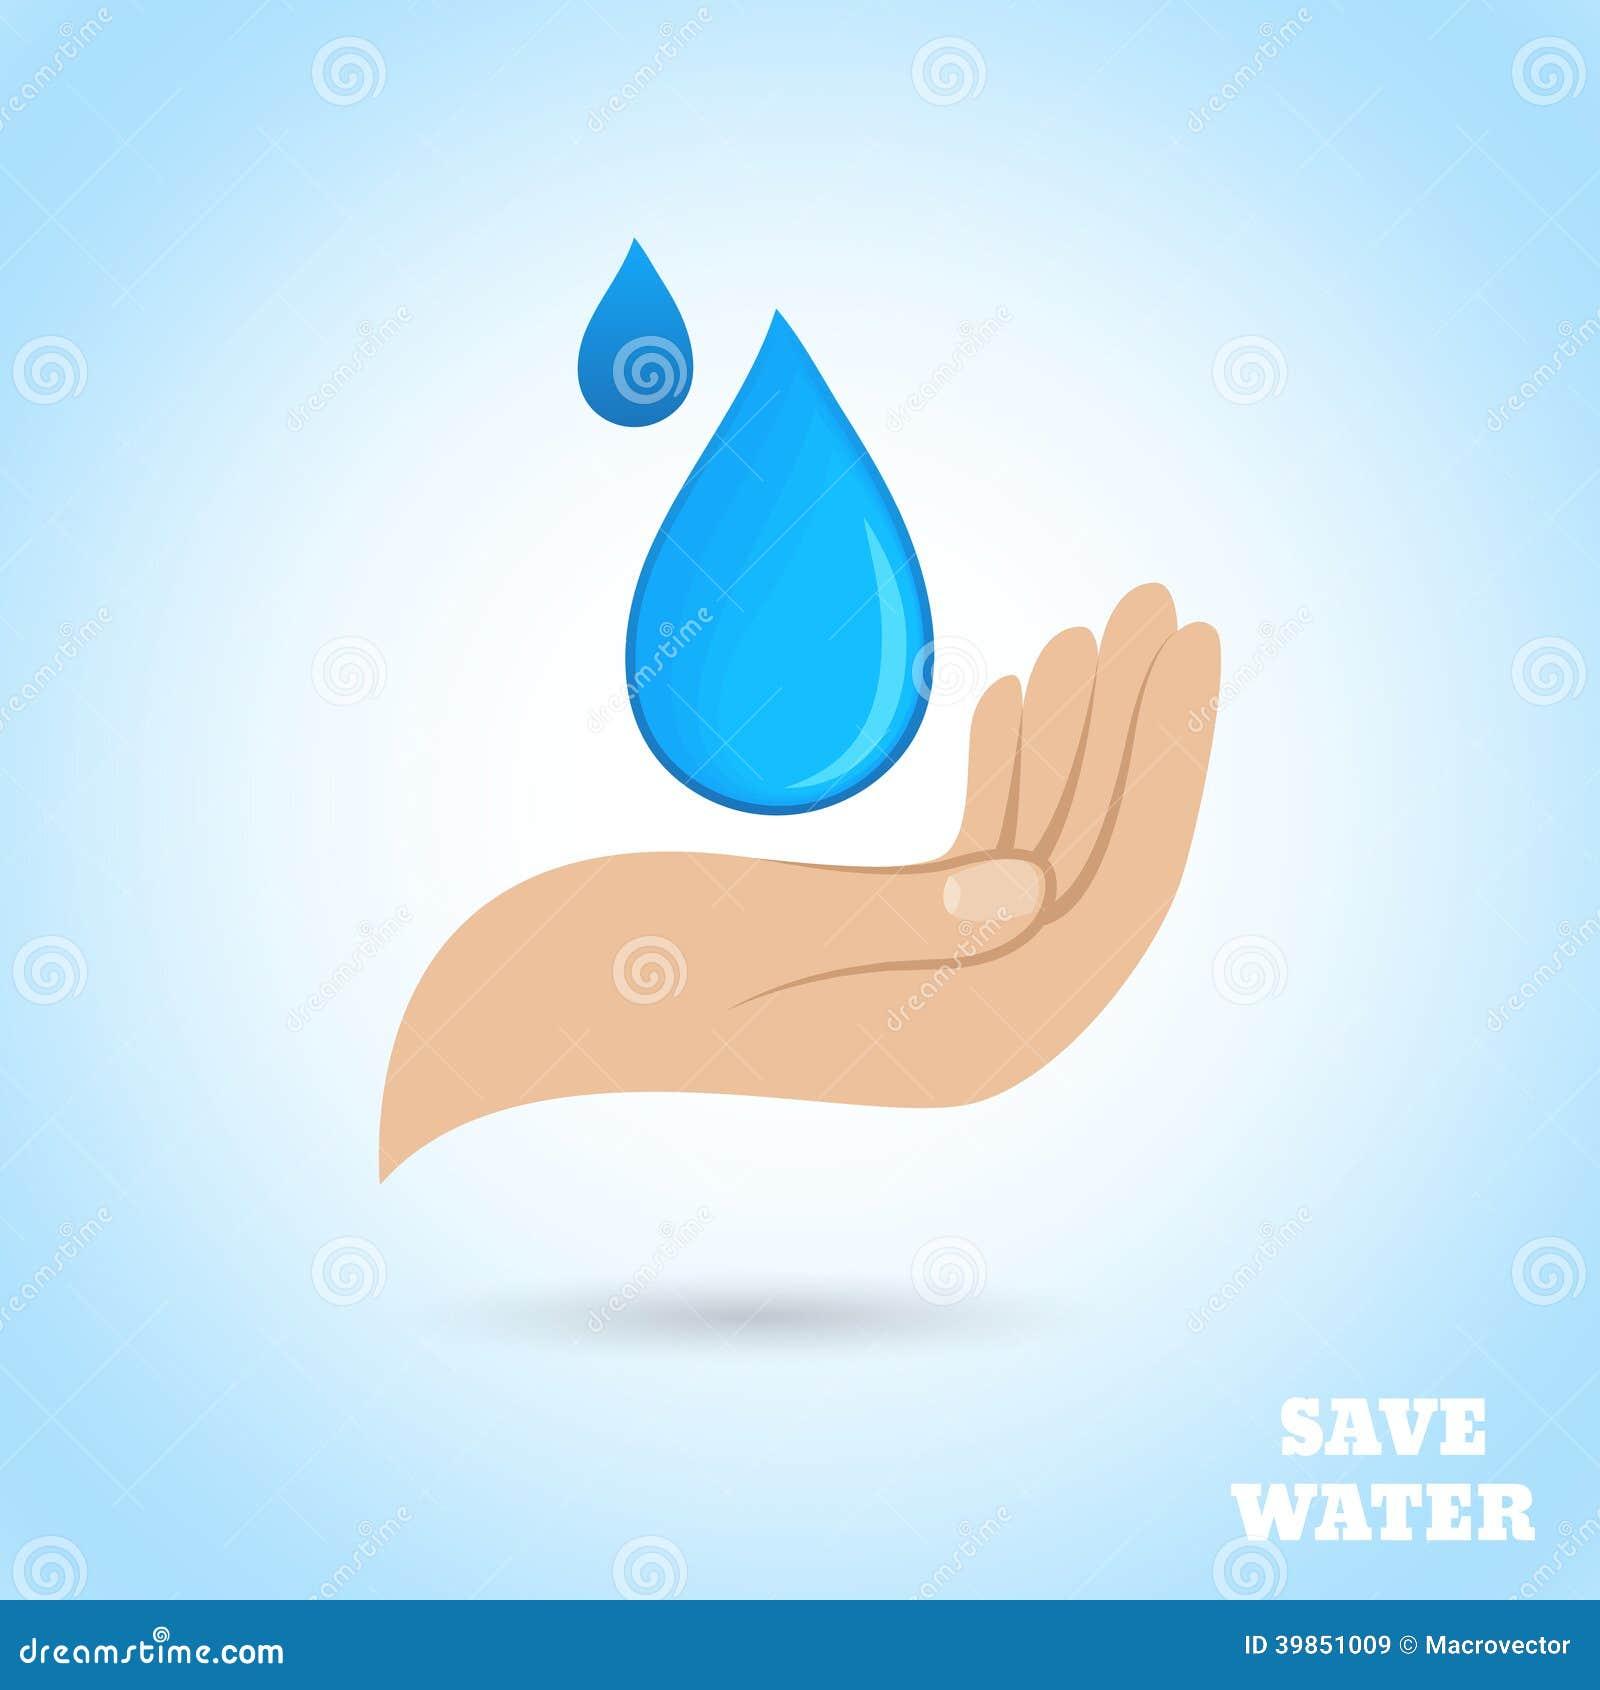 Save Water - Poster Stock Photos - Image: 34144493